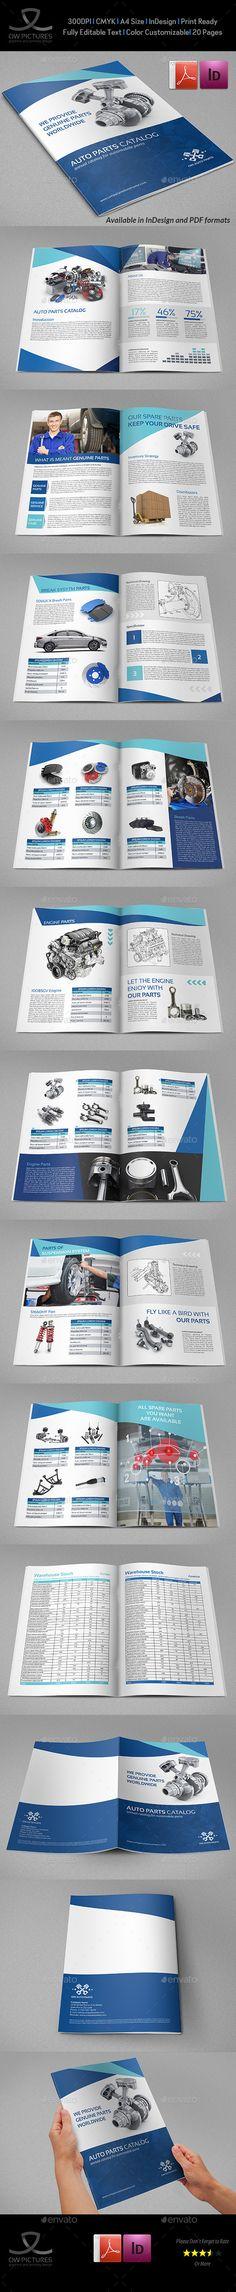 Auto Parts Catalog Brochure Template - 20 Pages